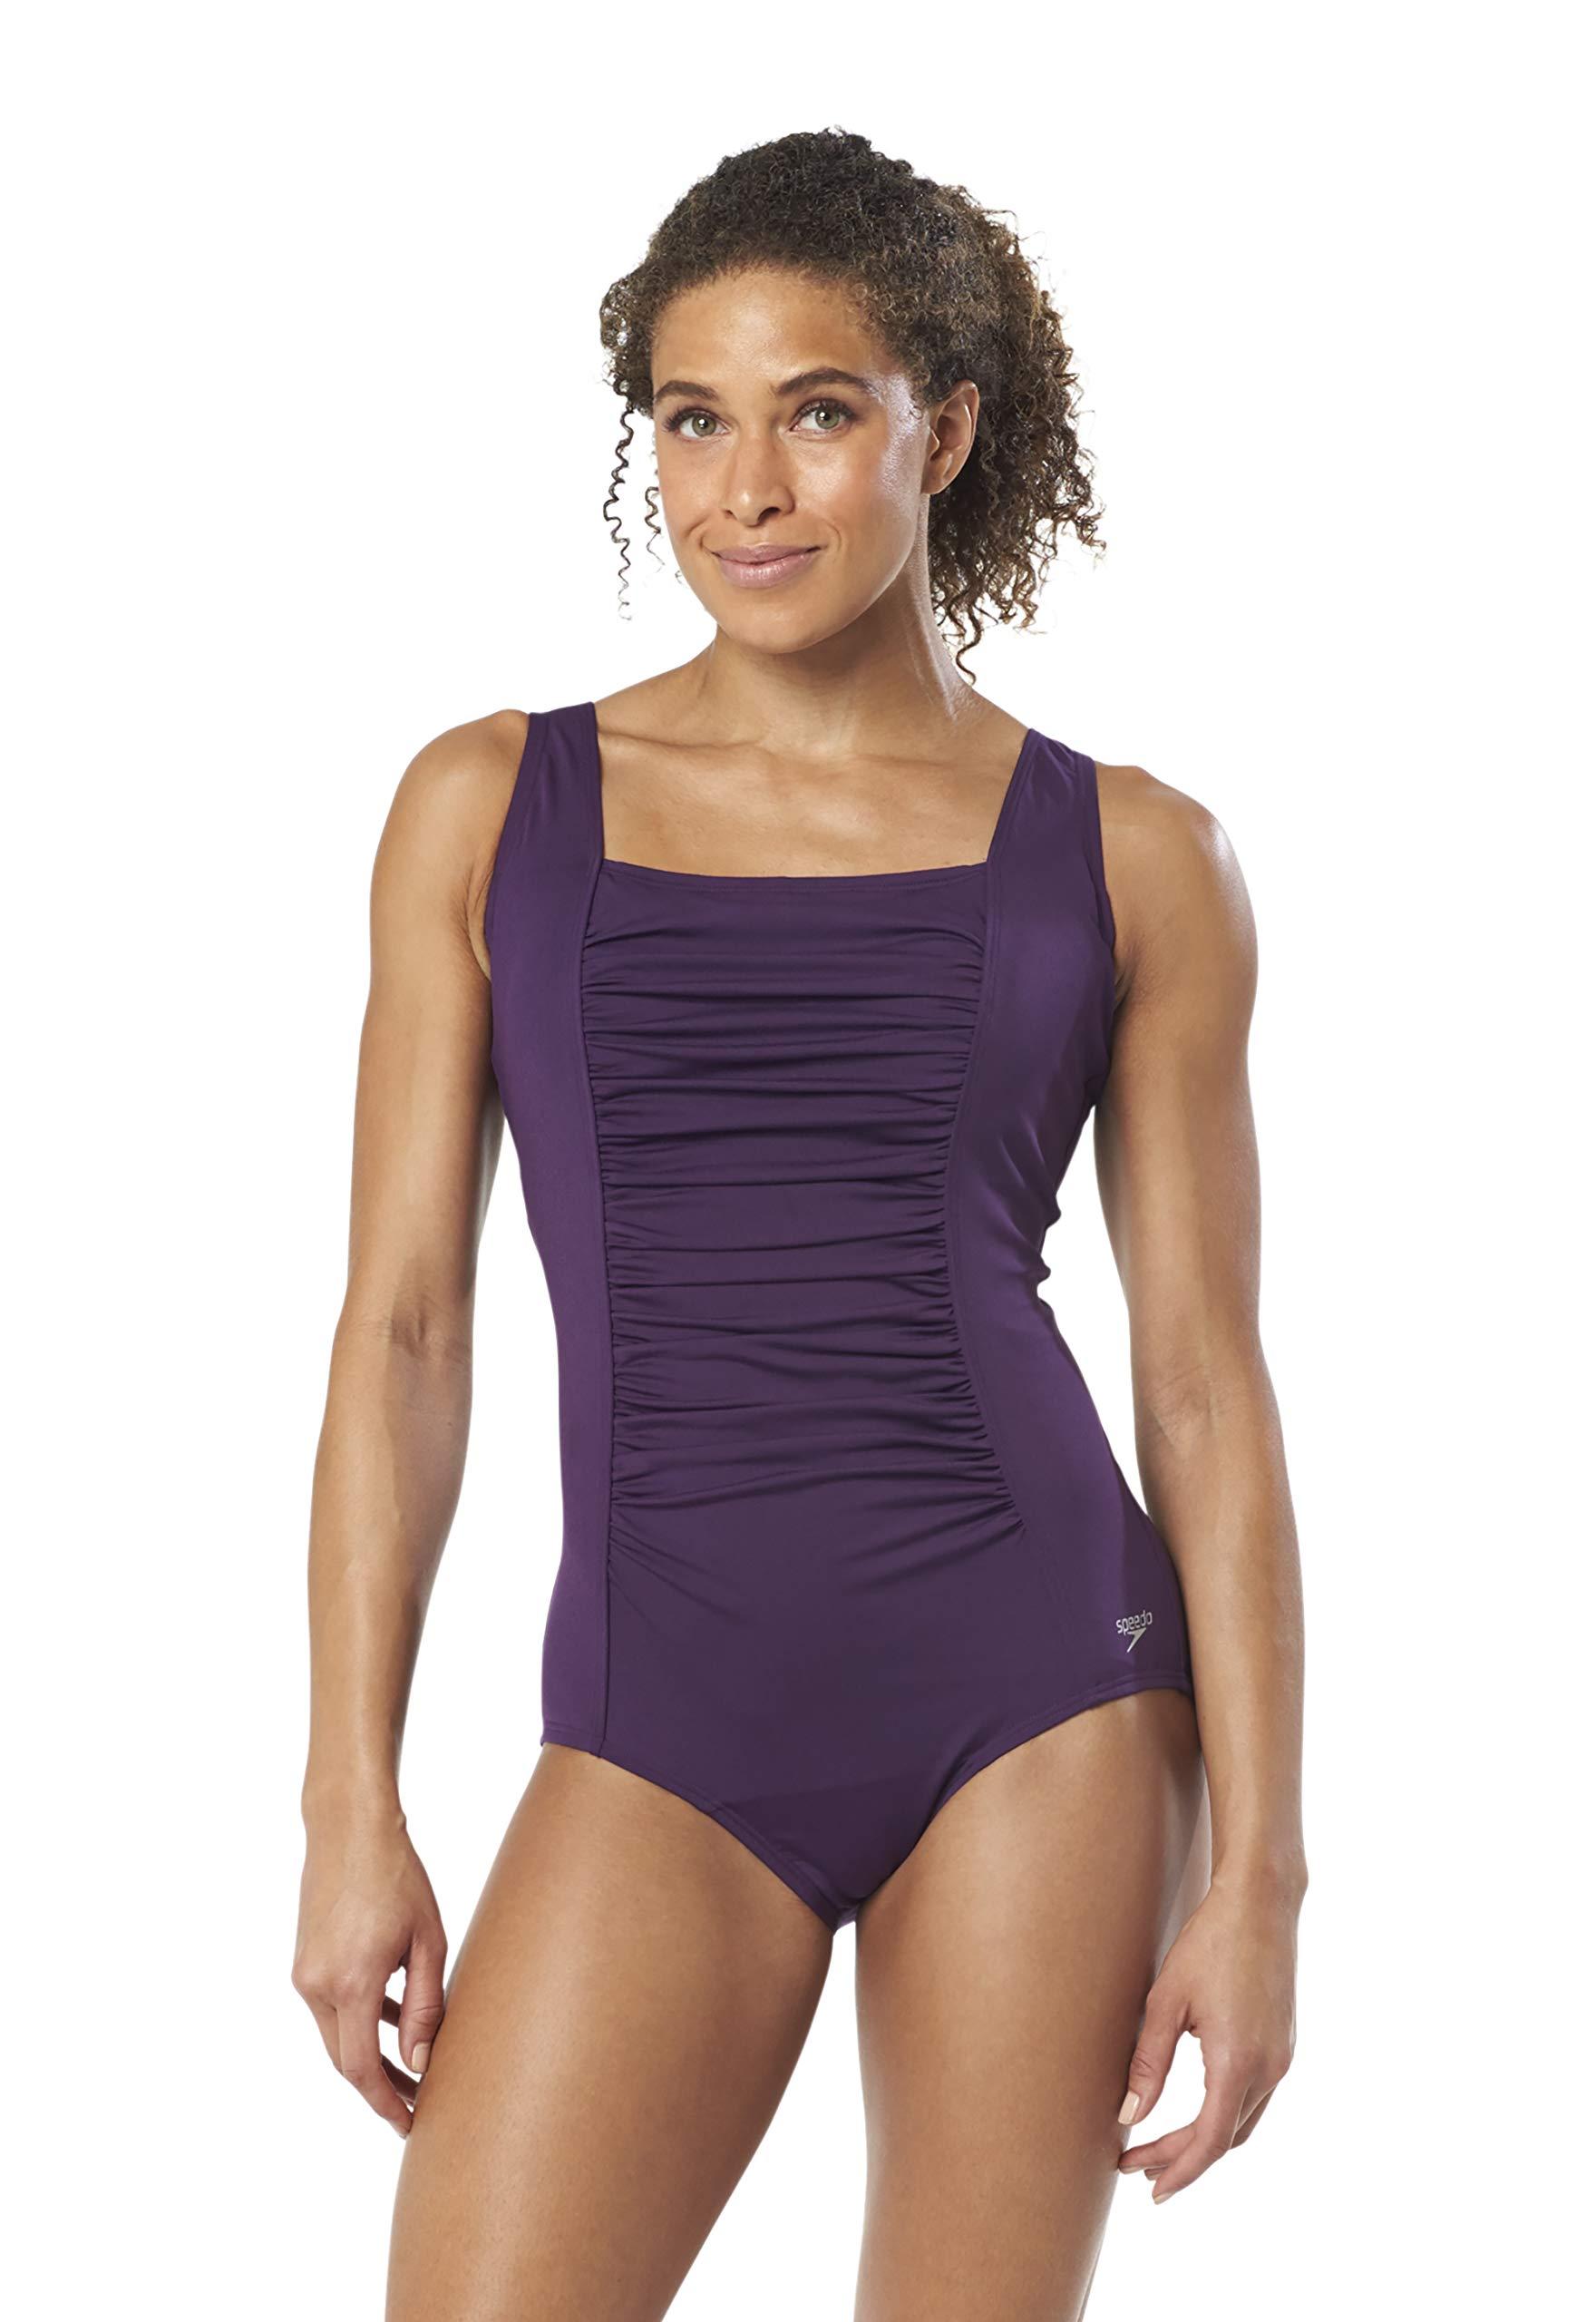 40f781dd8 Speedo Women s Endurance+ Shirred Tank Onepiece Swimsuit product image